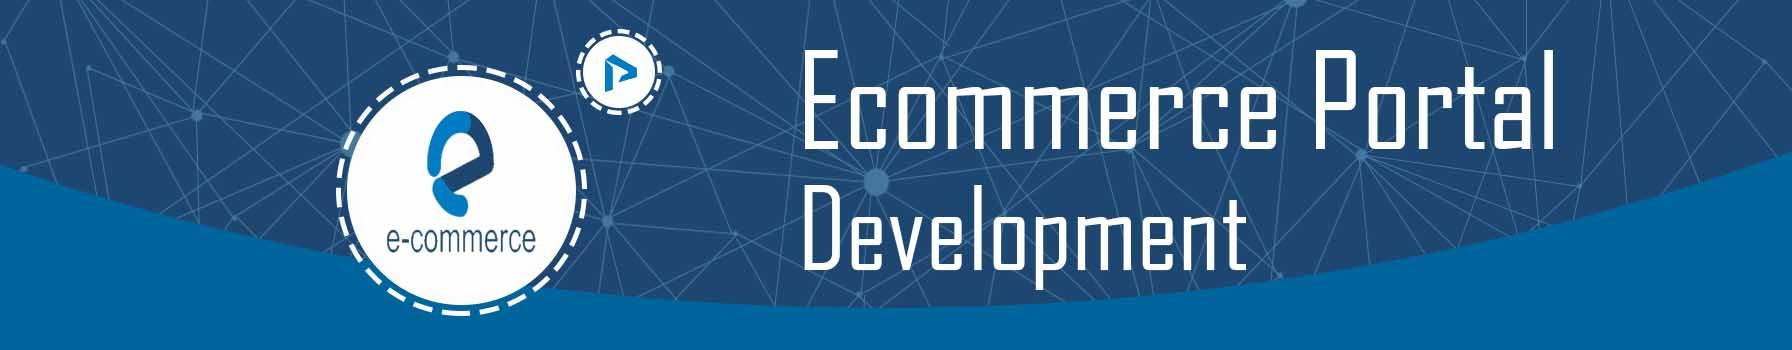 e-commerce-portal-development.jpg